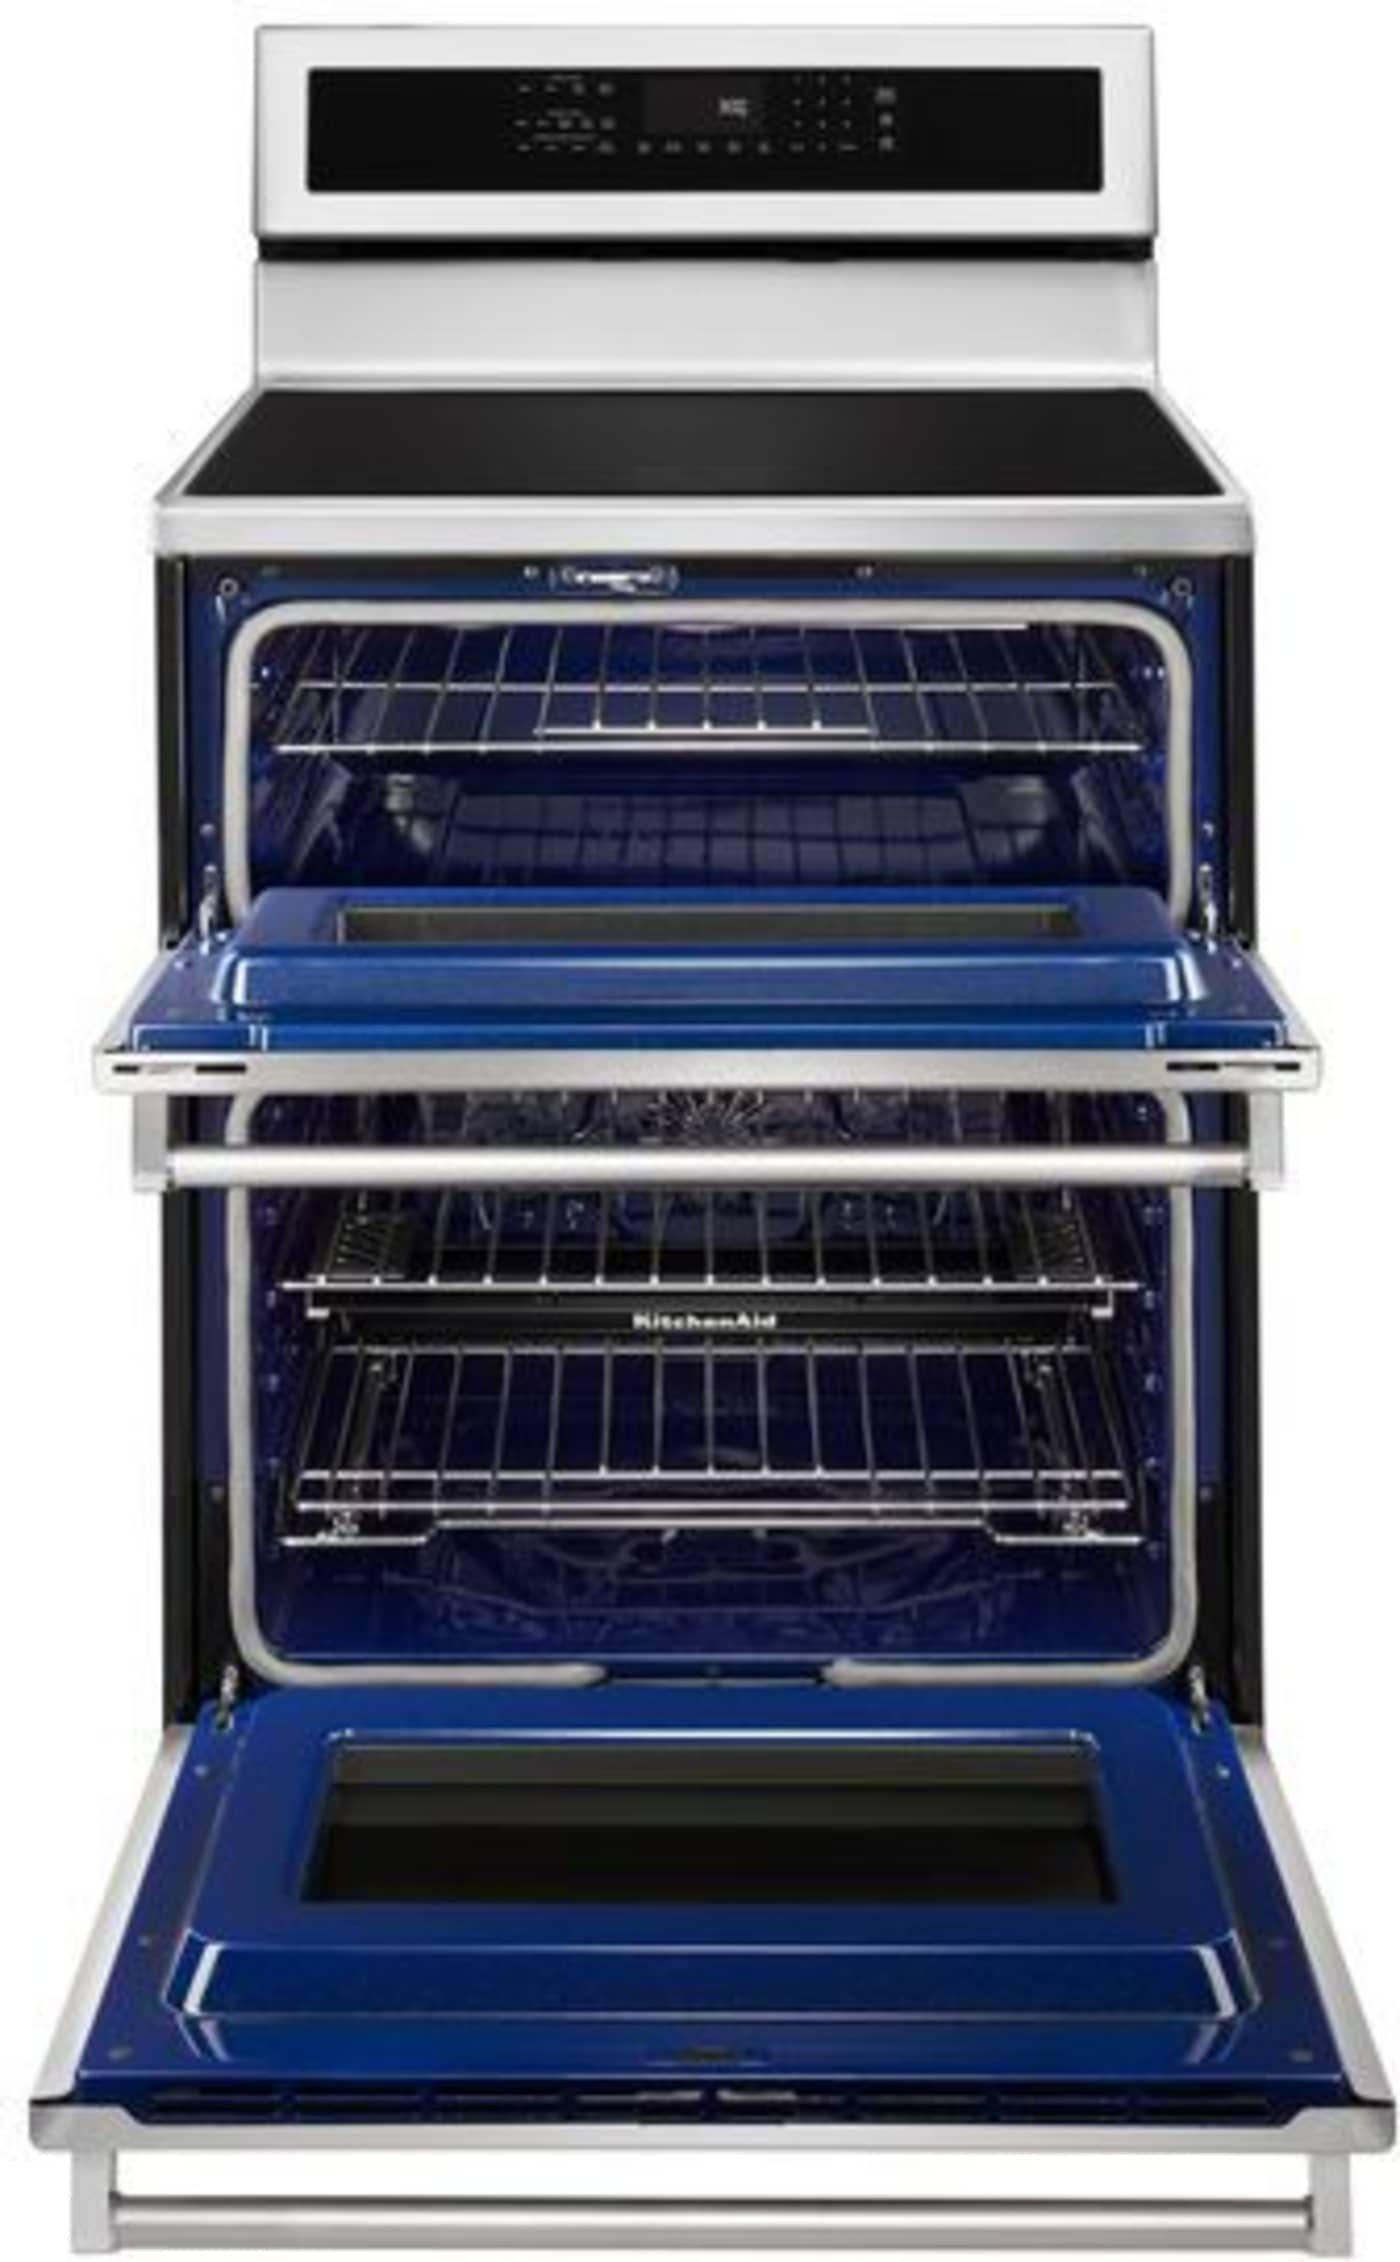 Kfid500ess by kitchenaid electric ranges